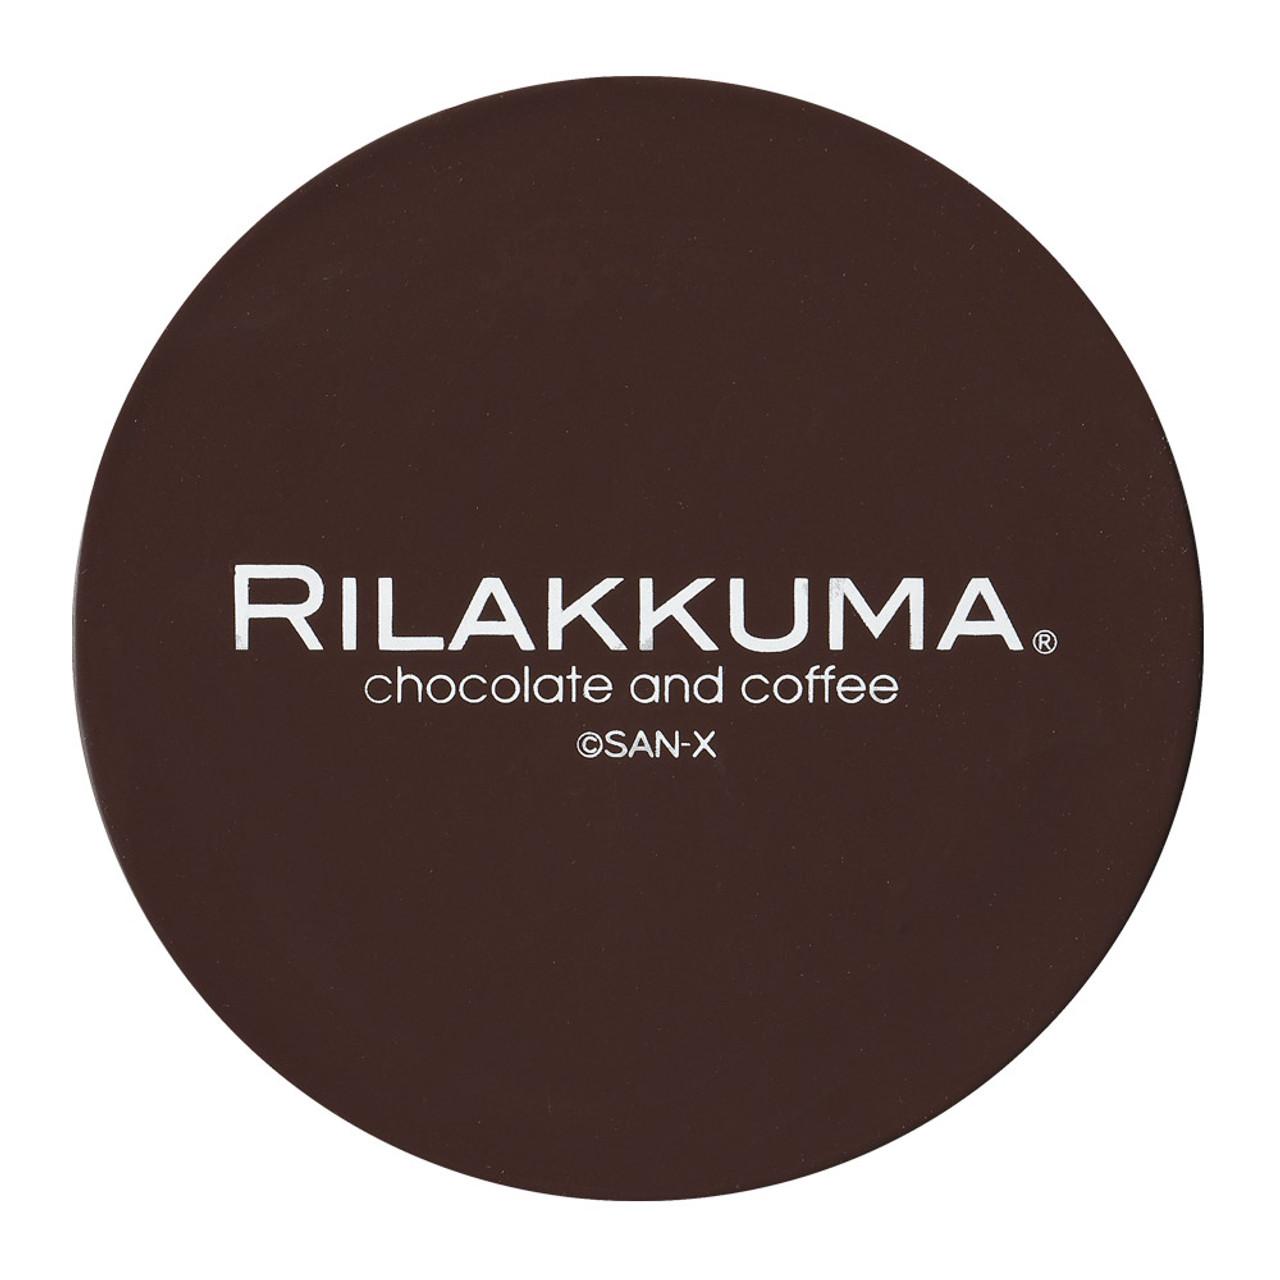 San-x Rilakkuma Circle Chocolate Coffee Cup Coaster - KY00901 ( Back View )